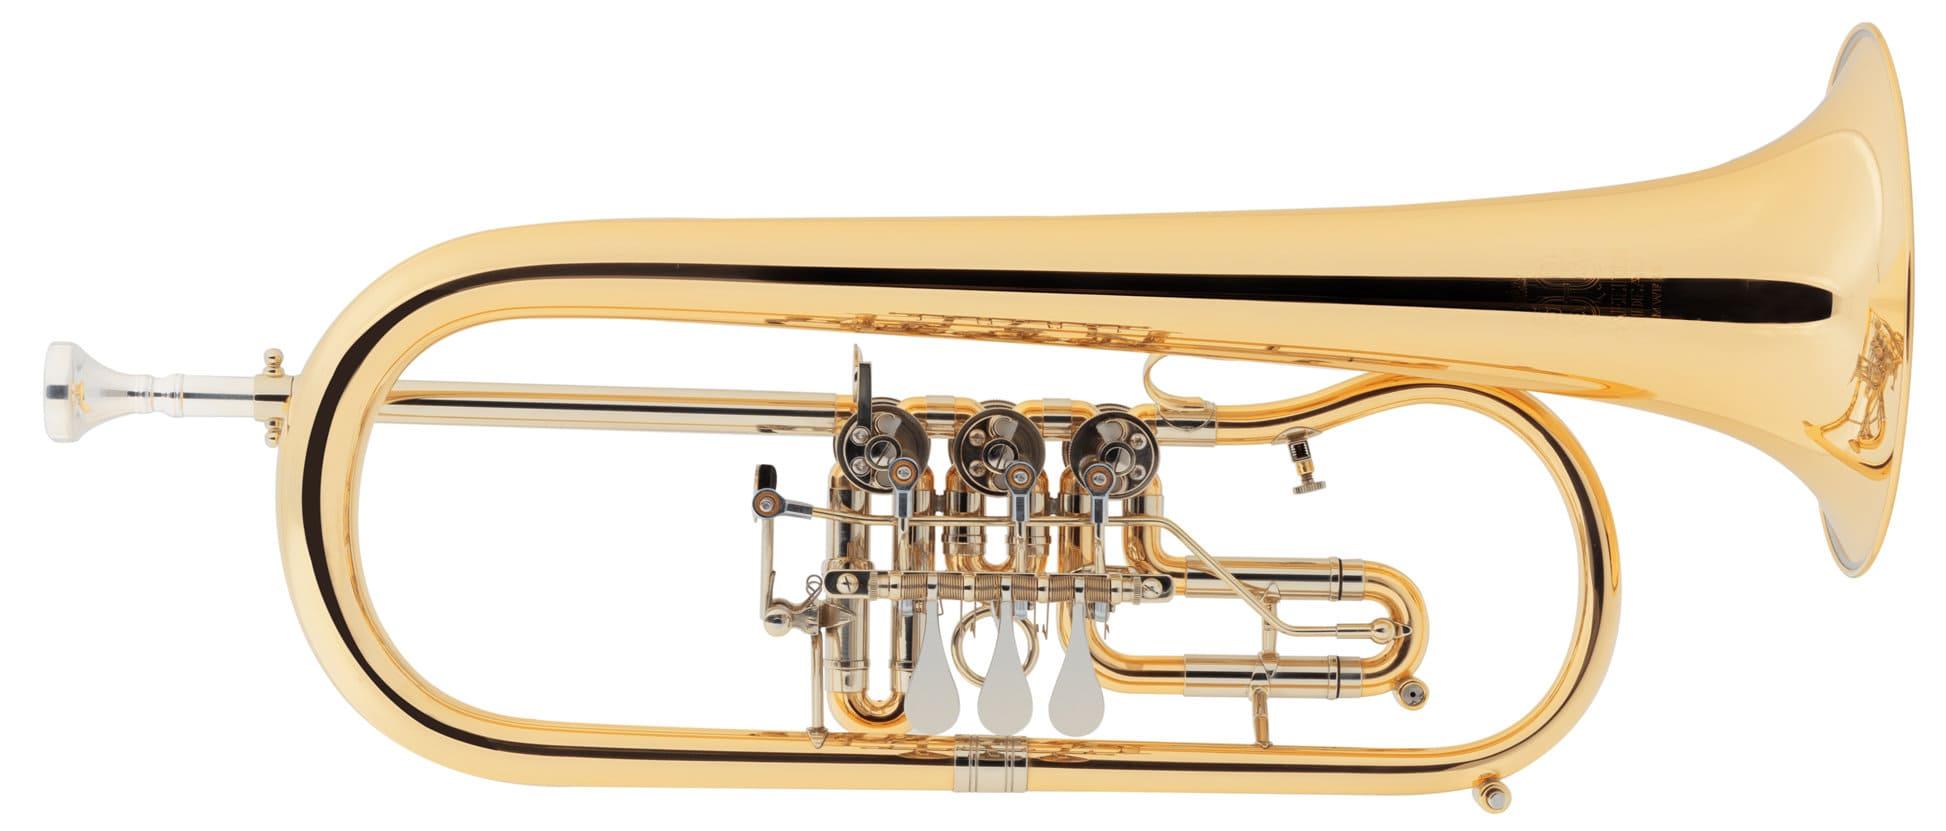 Hoerner - Melton MWF 12 GT 1 0 Flügelhorn - Onlineshop Musikhaus Kirstein